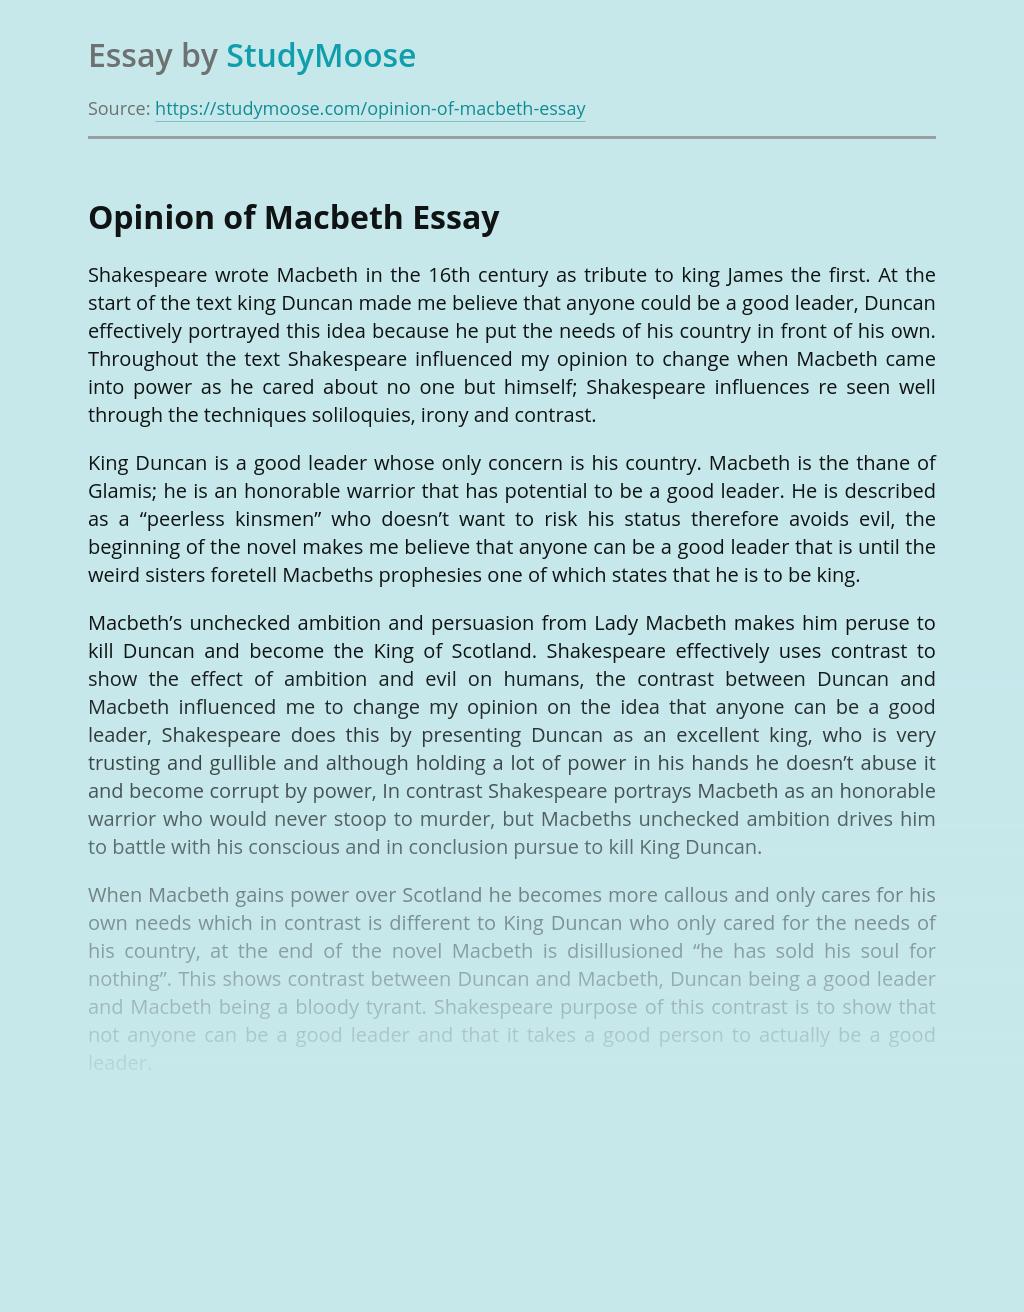 Opinion of Macbeth